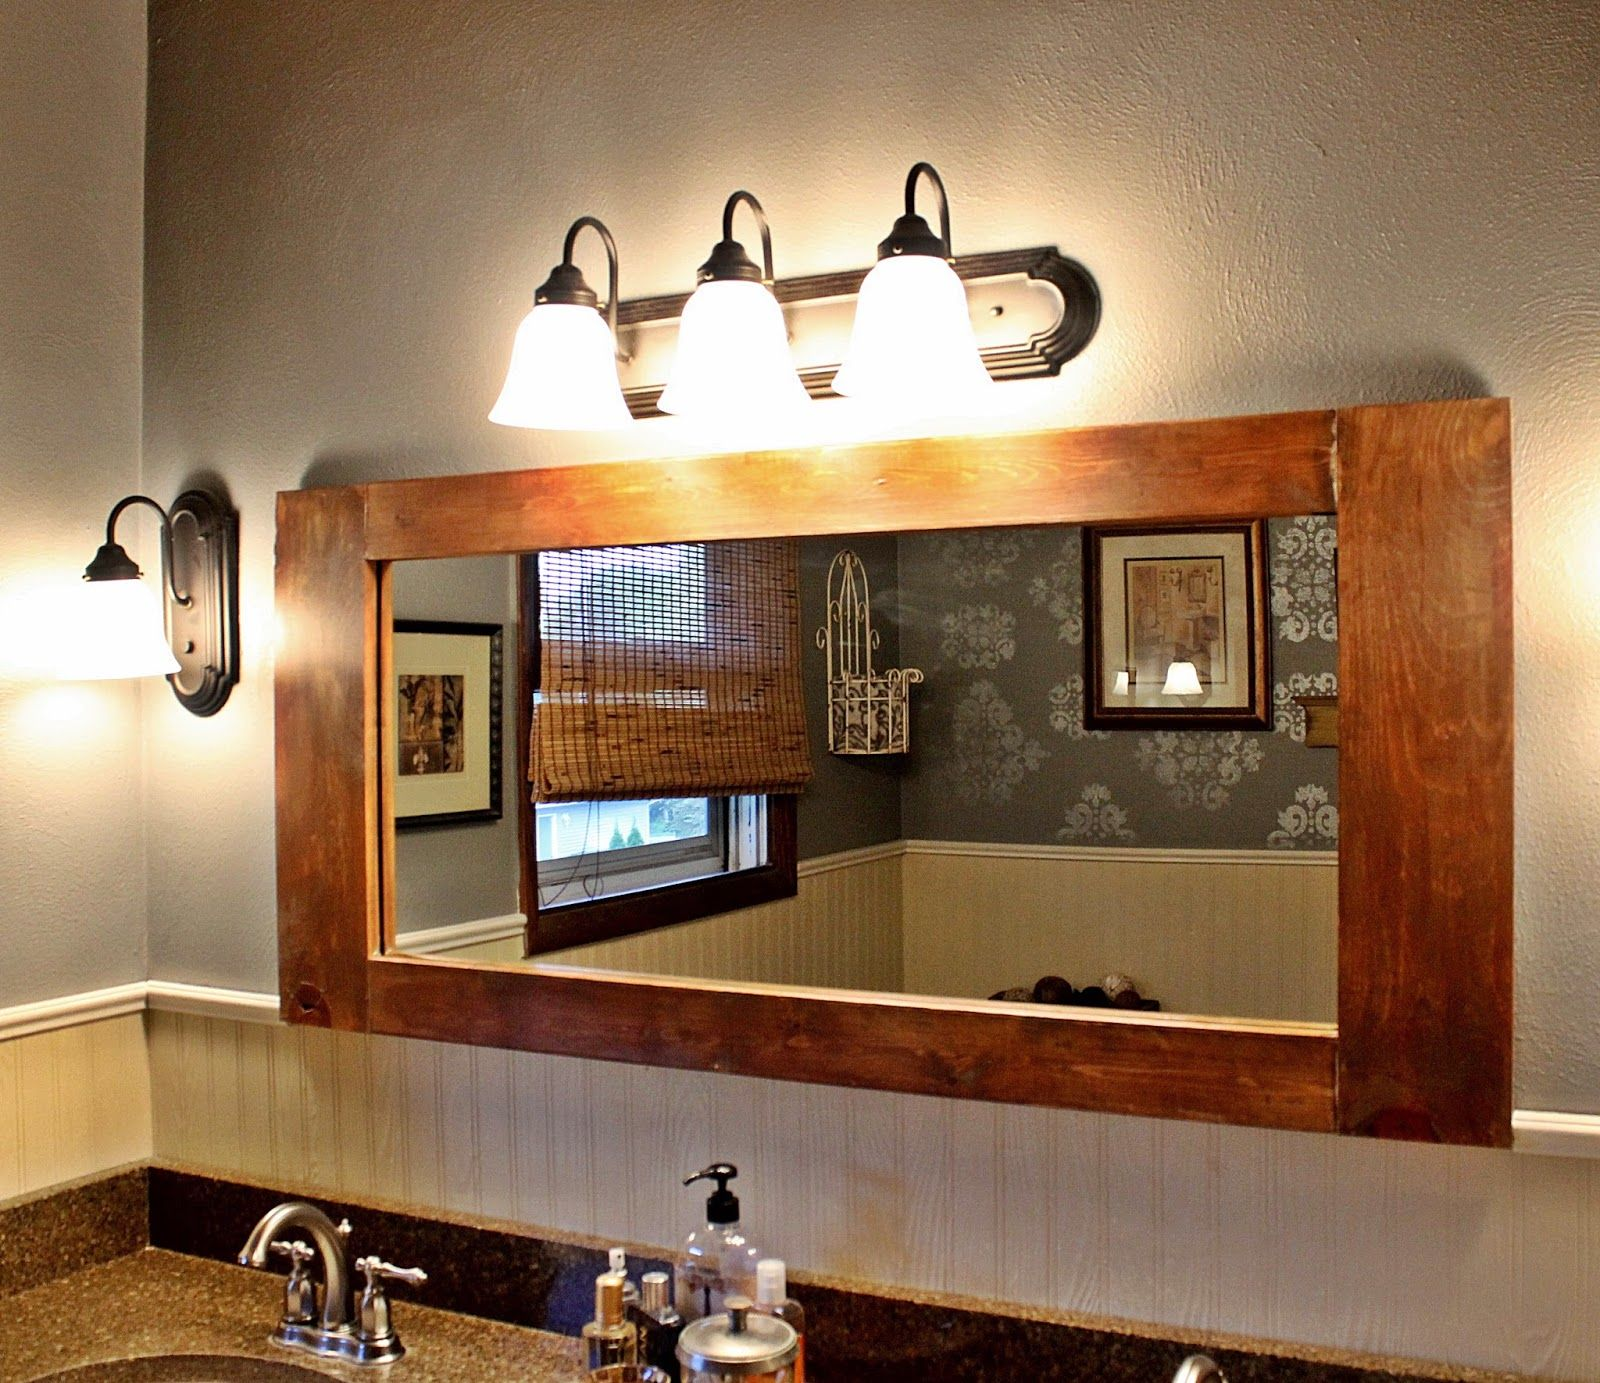 Large diy bathroom vanity mirror for under the decorating